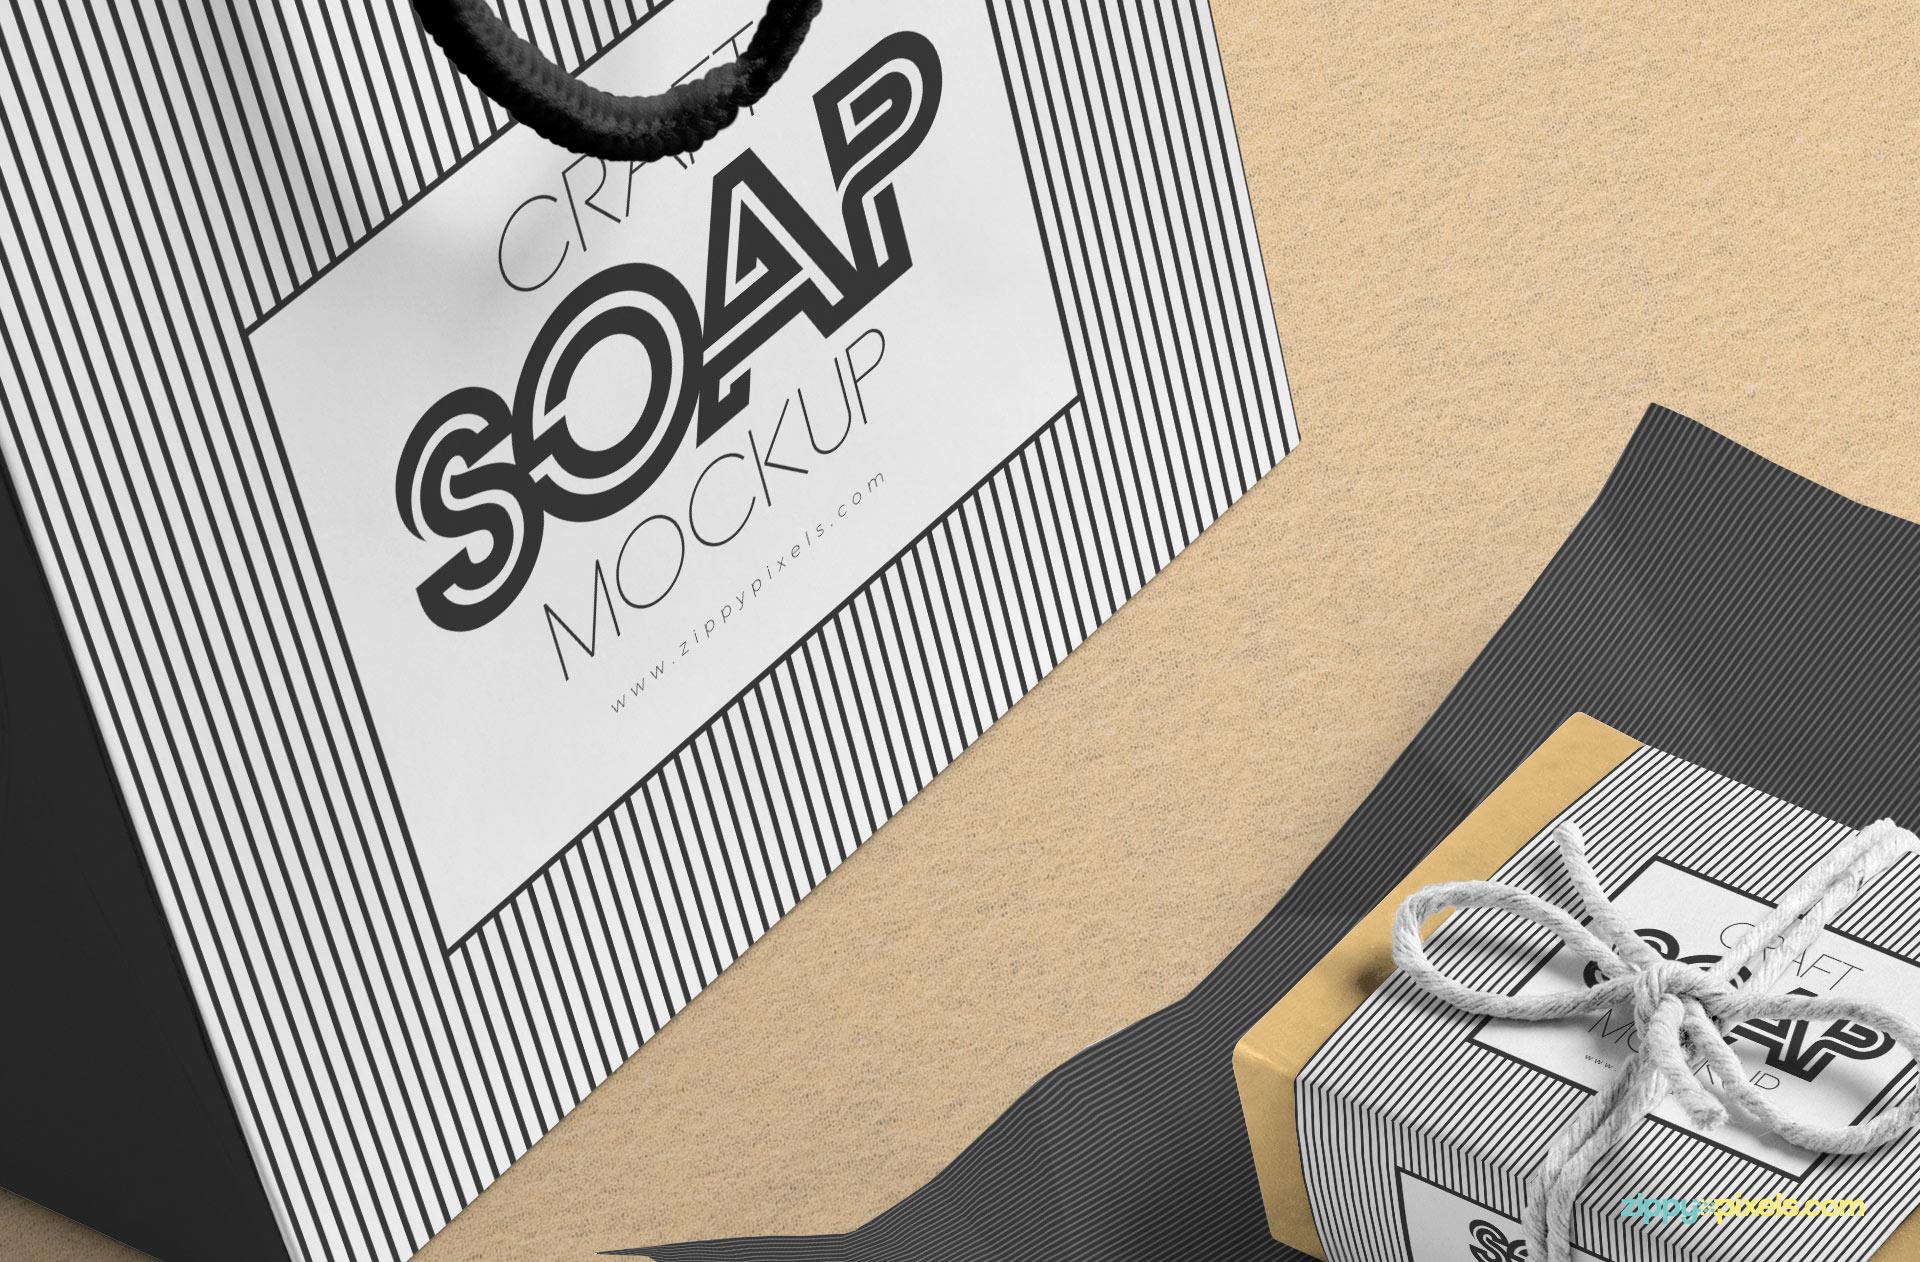 Soap Bar with Shopping Bag PSD Mockup Design